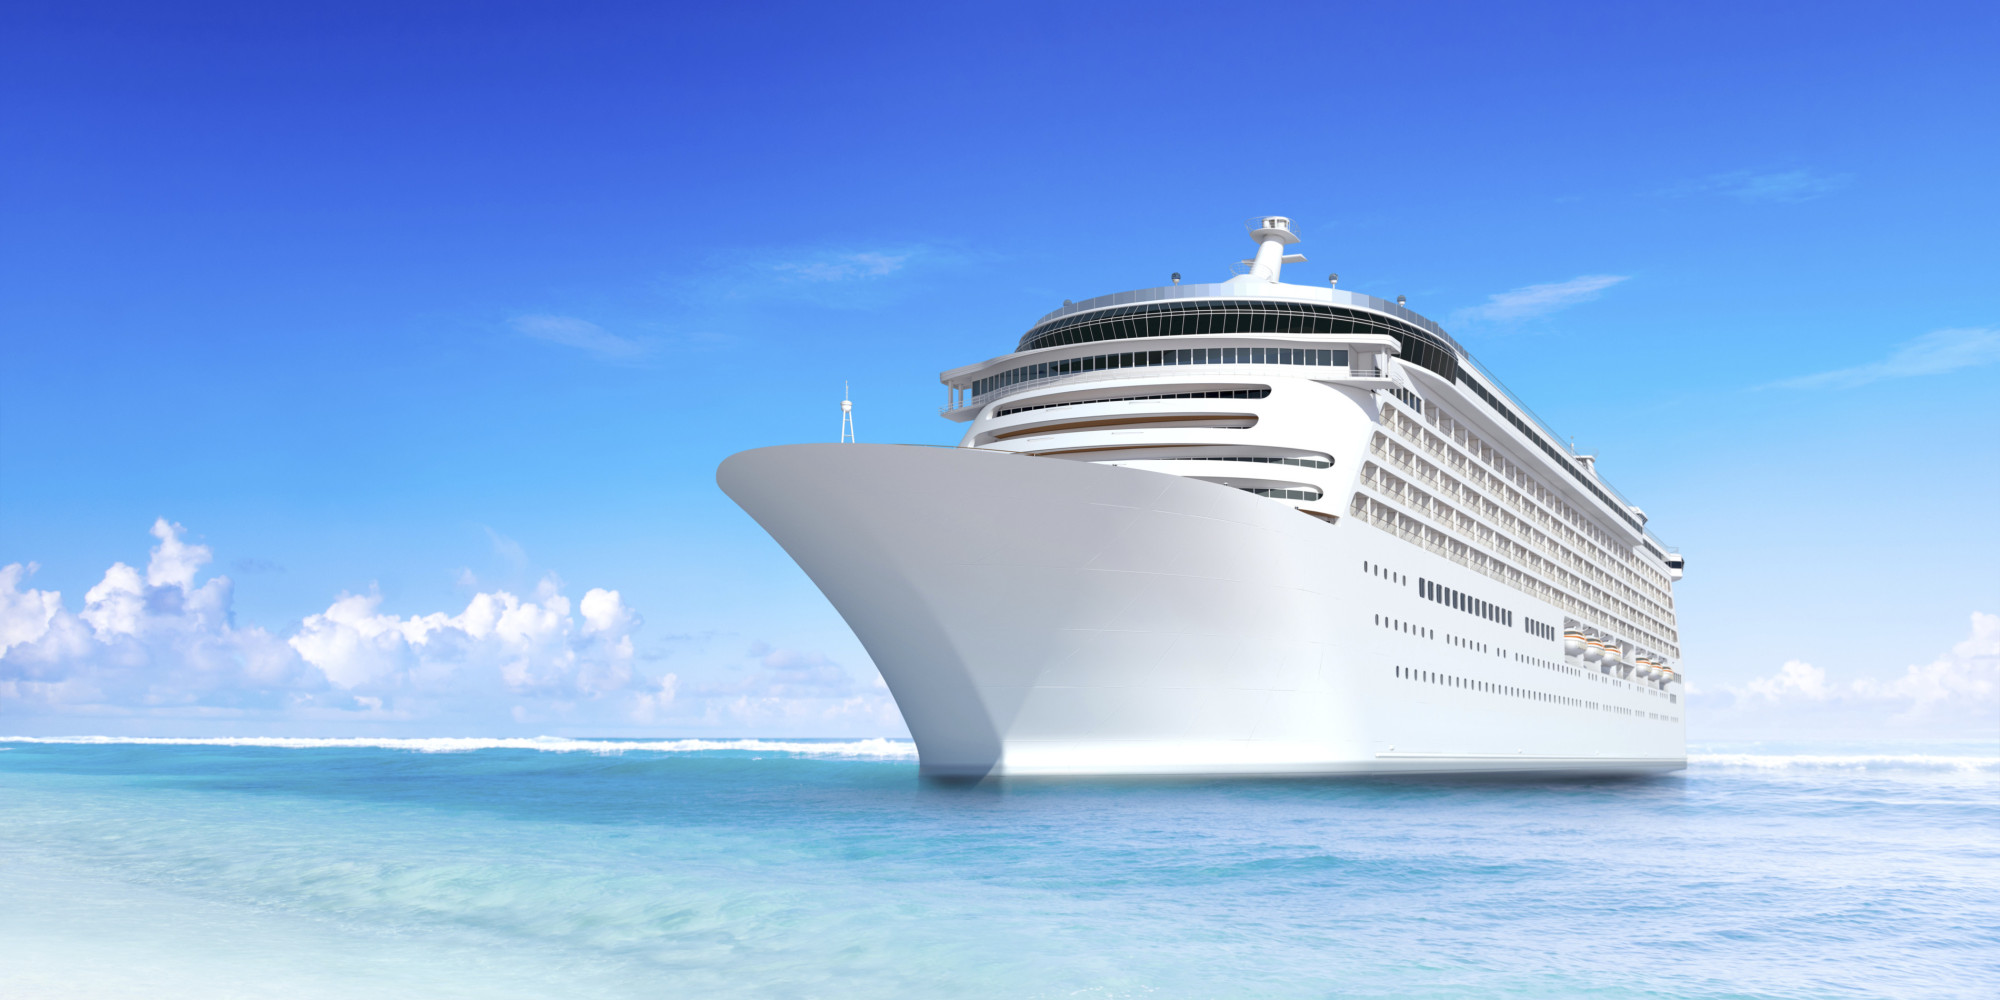 Cruise Ship With Wonderful Tropical Beach